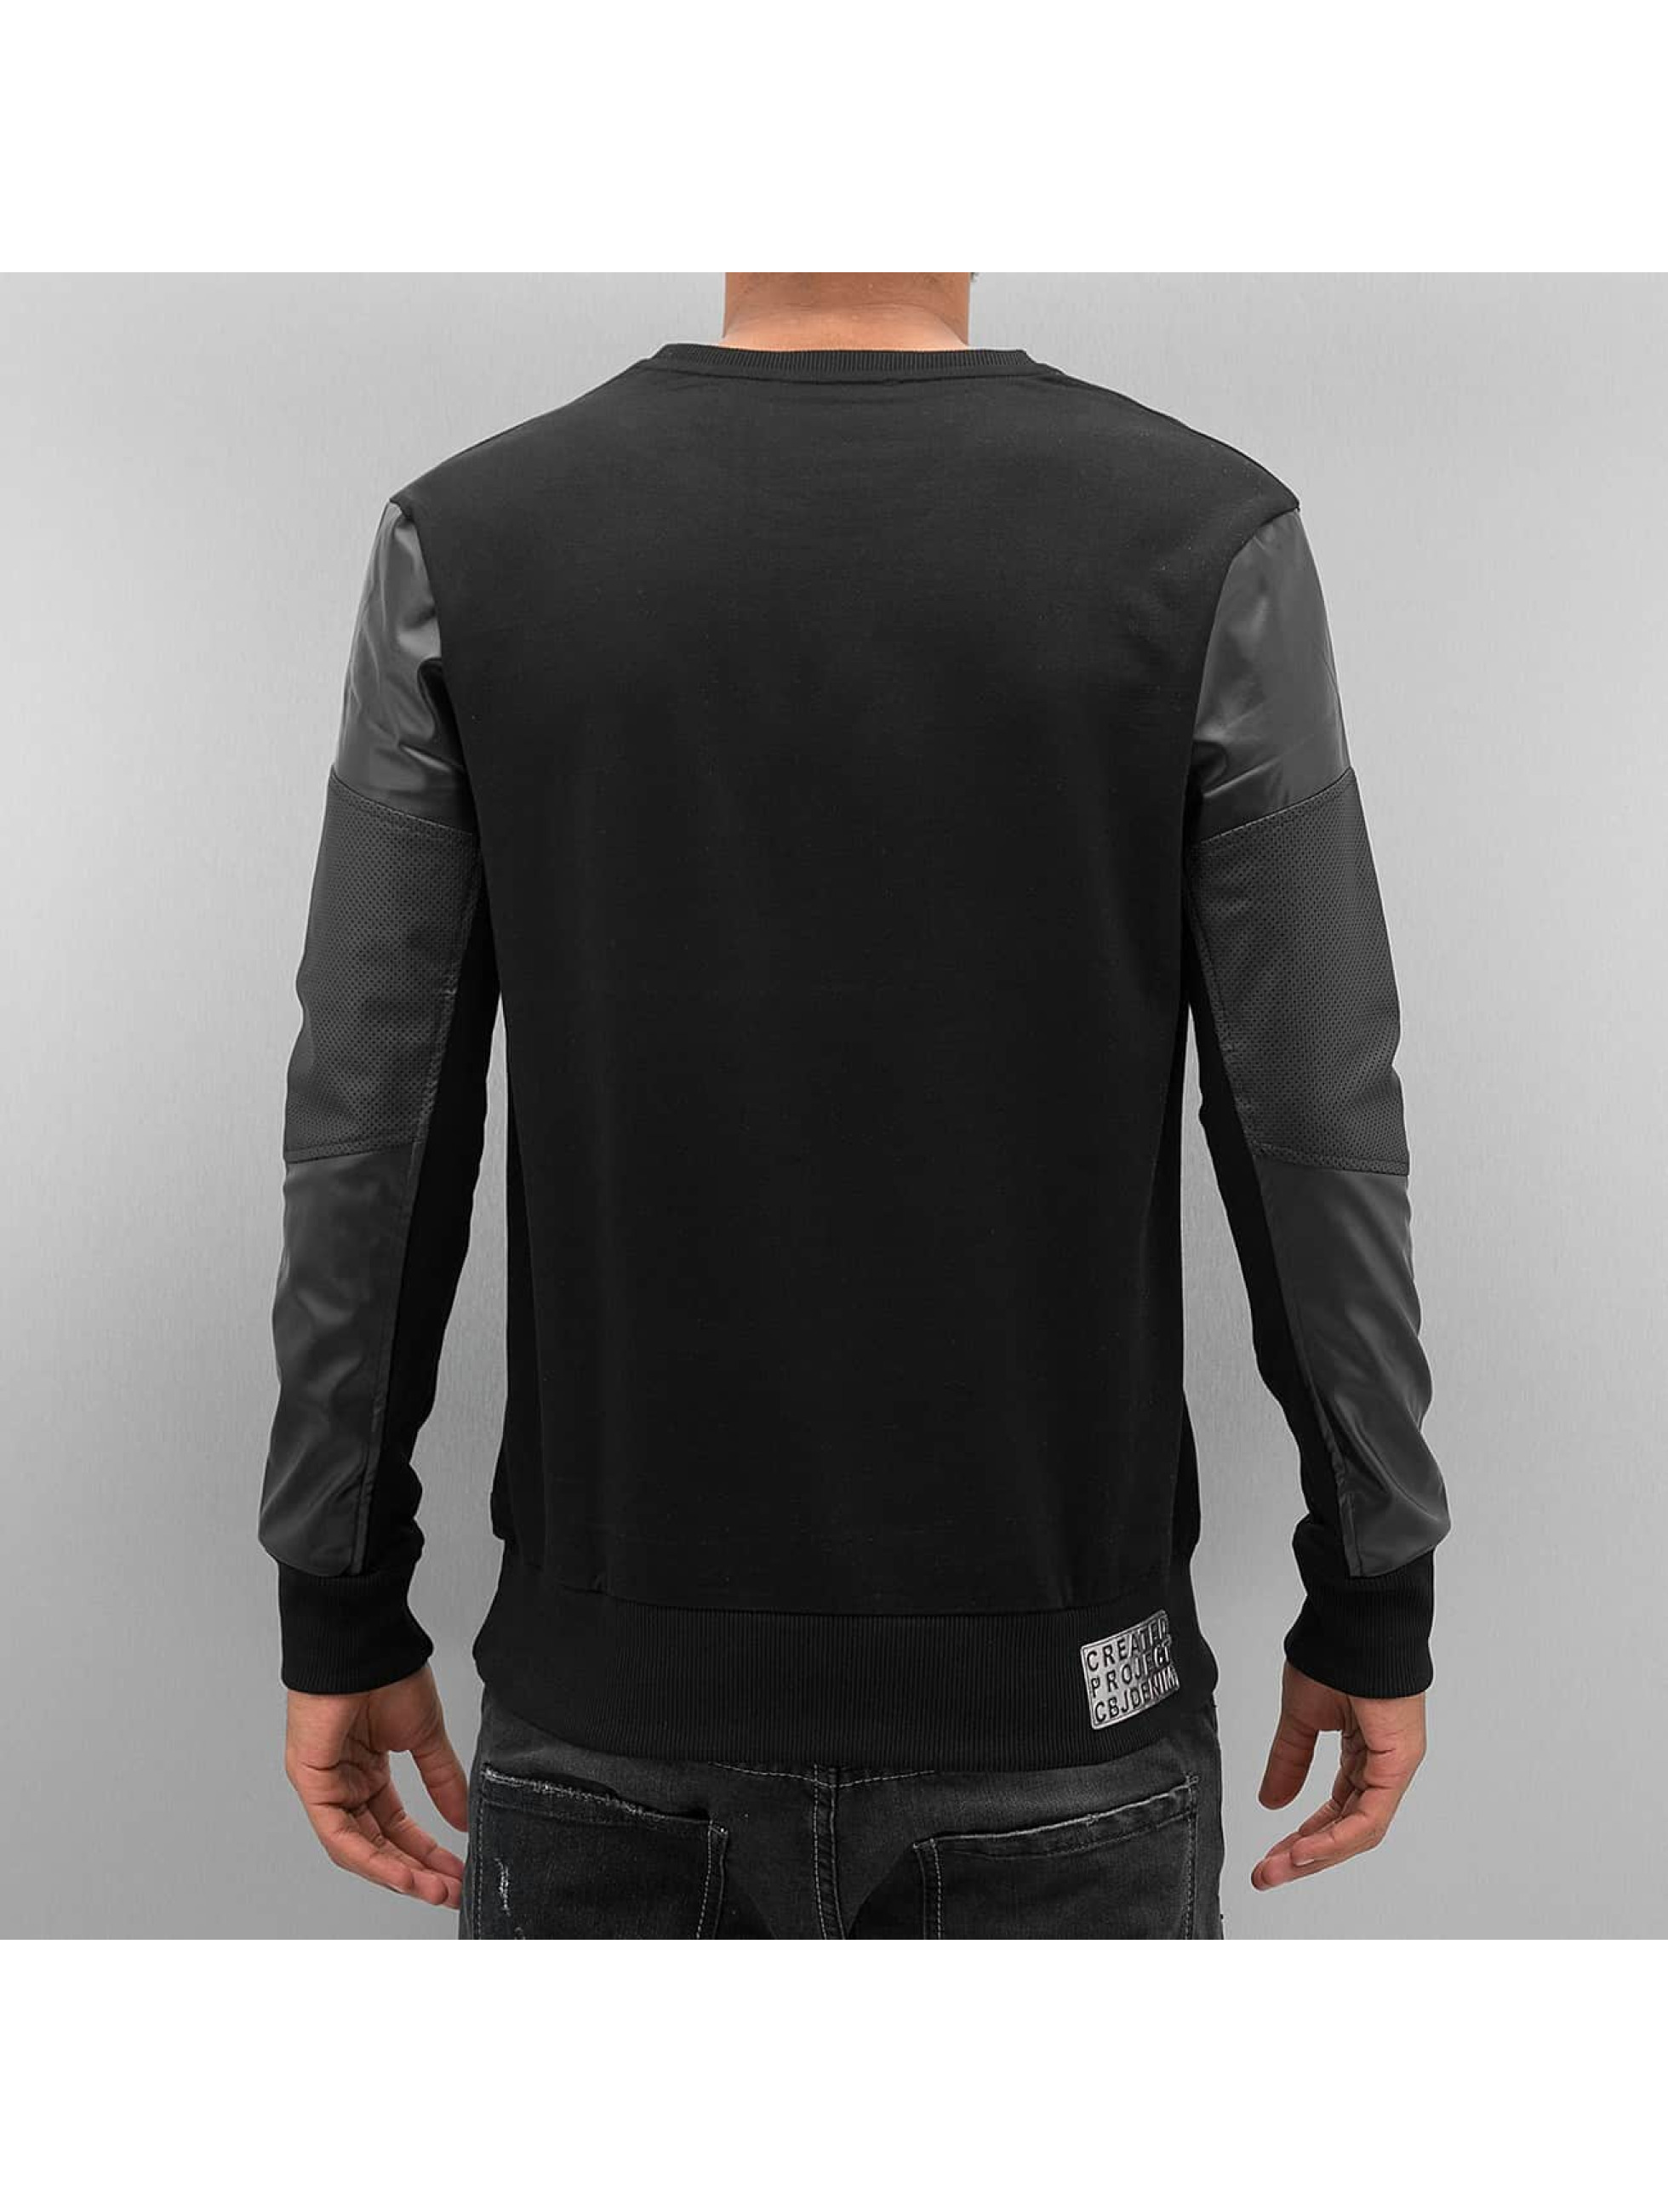 Cipo & Baxx Пуловер Fake Leather черный